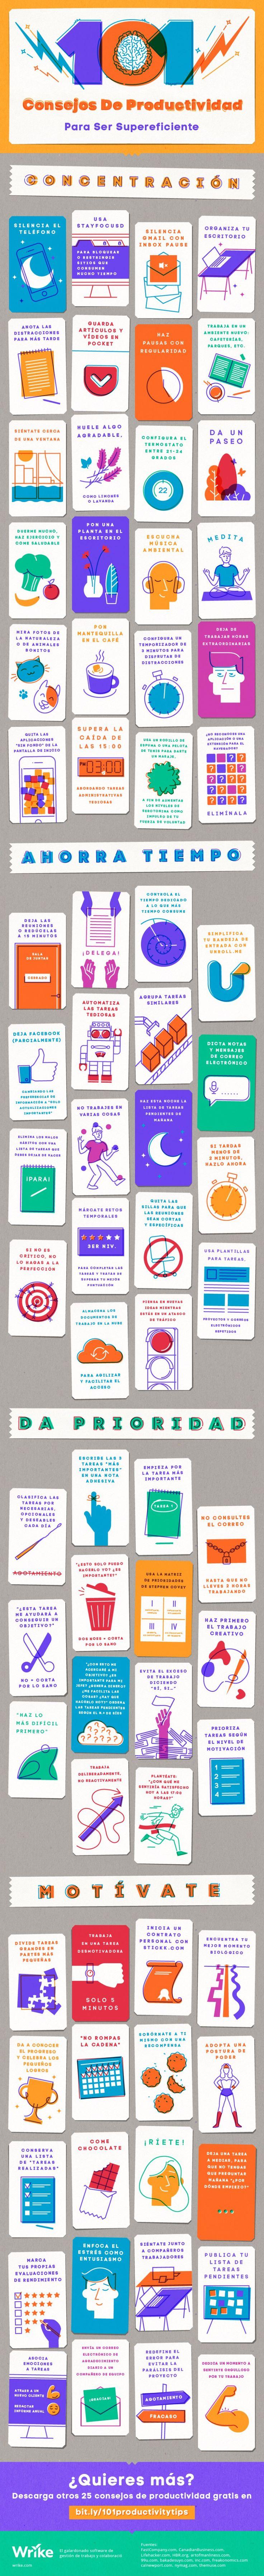 101 consejos de Productividad para ser supereficiente #infografia